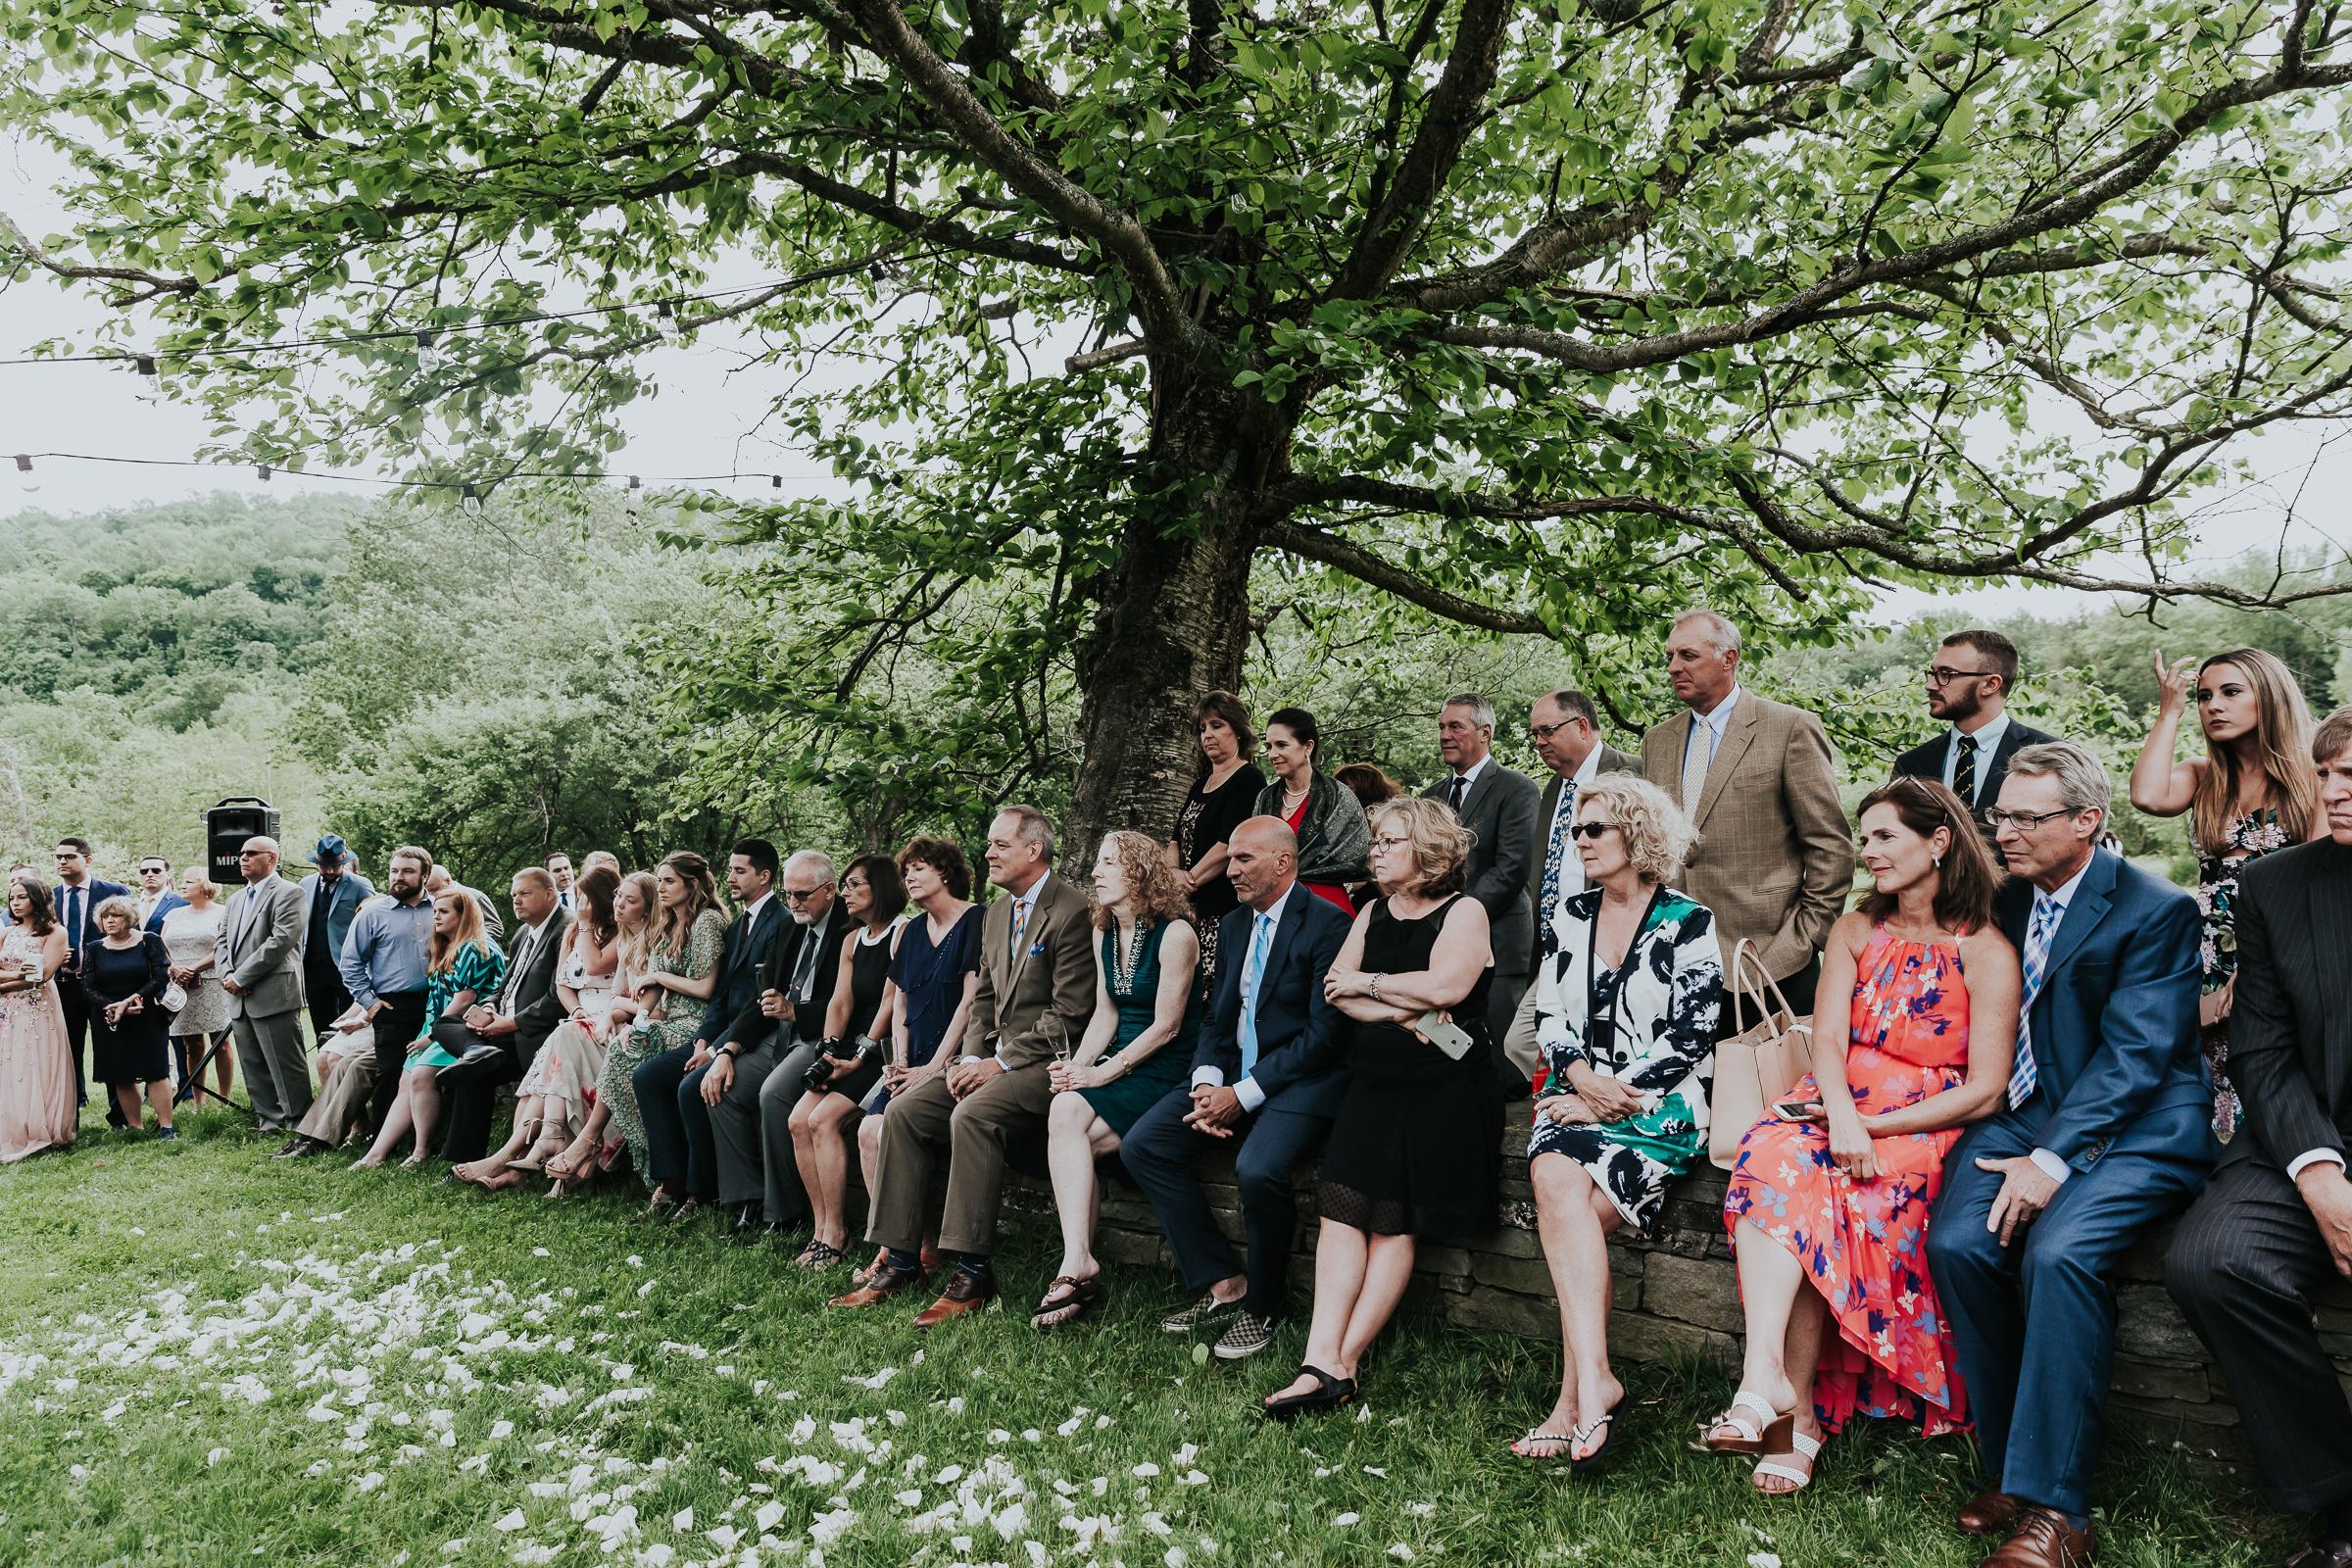 Handsome-Hollow-Long-Eddy-Catskills-New-York-Fine-Art-Documentary-Wedding-Photographer-66.jpg